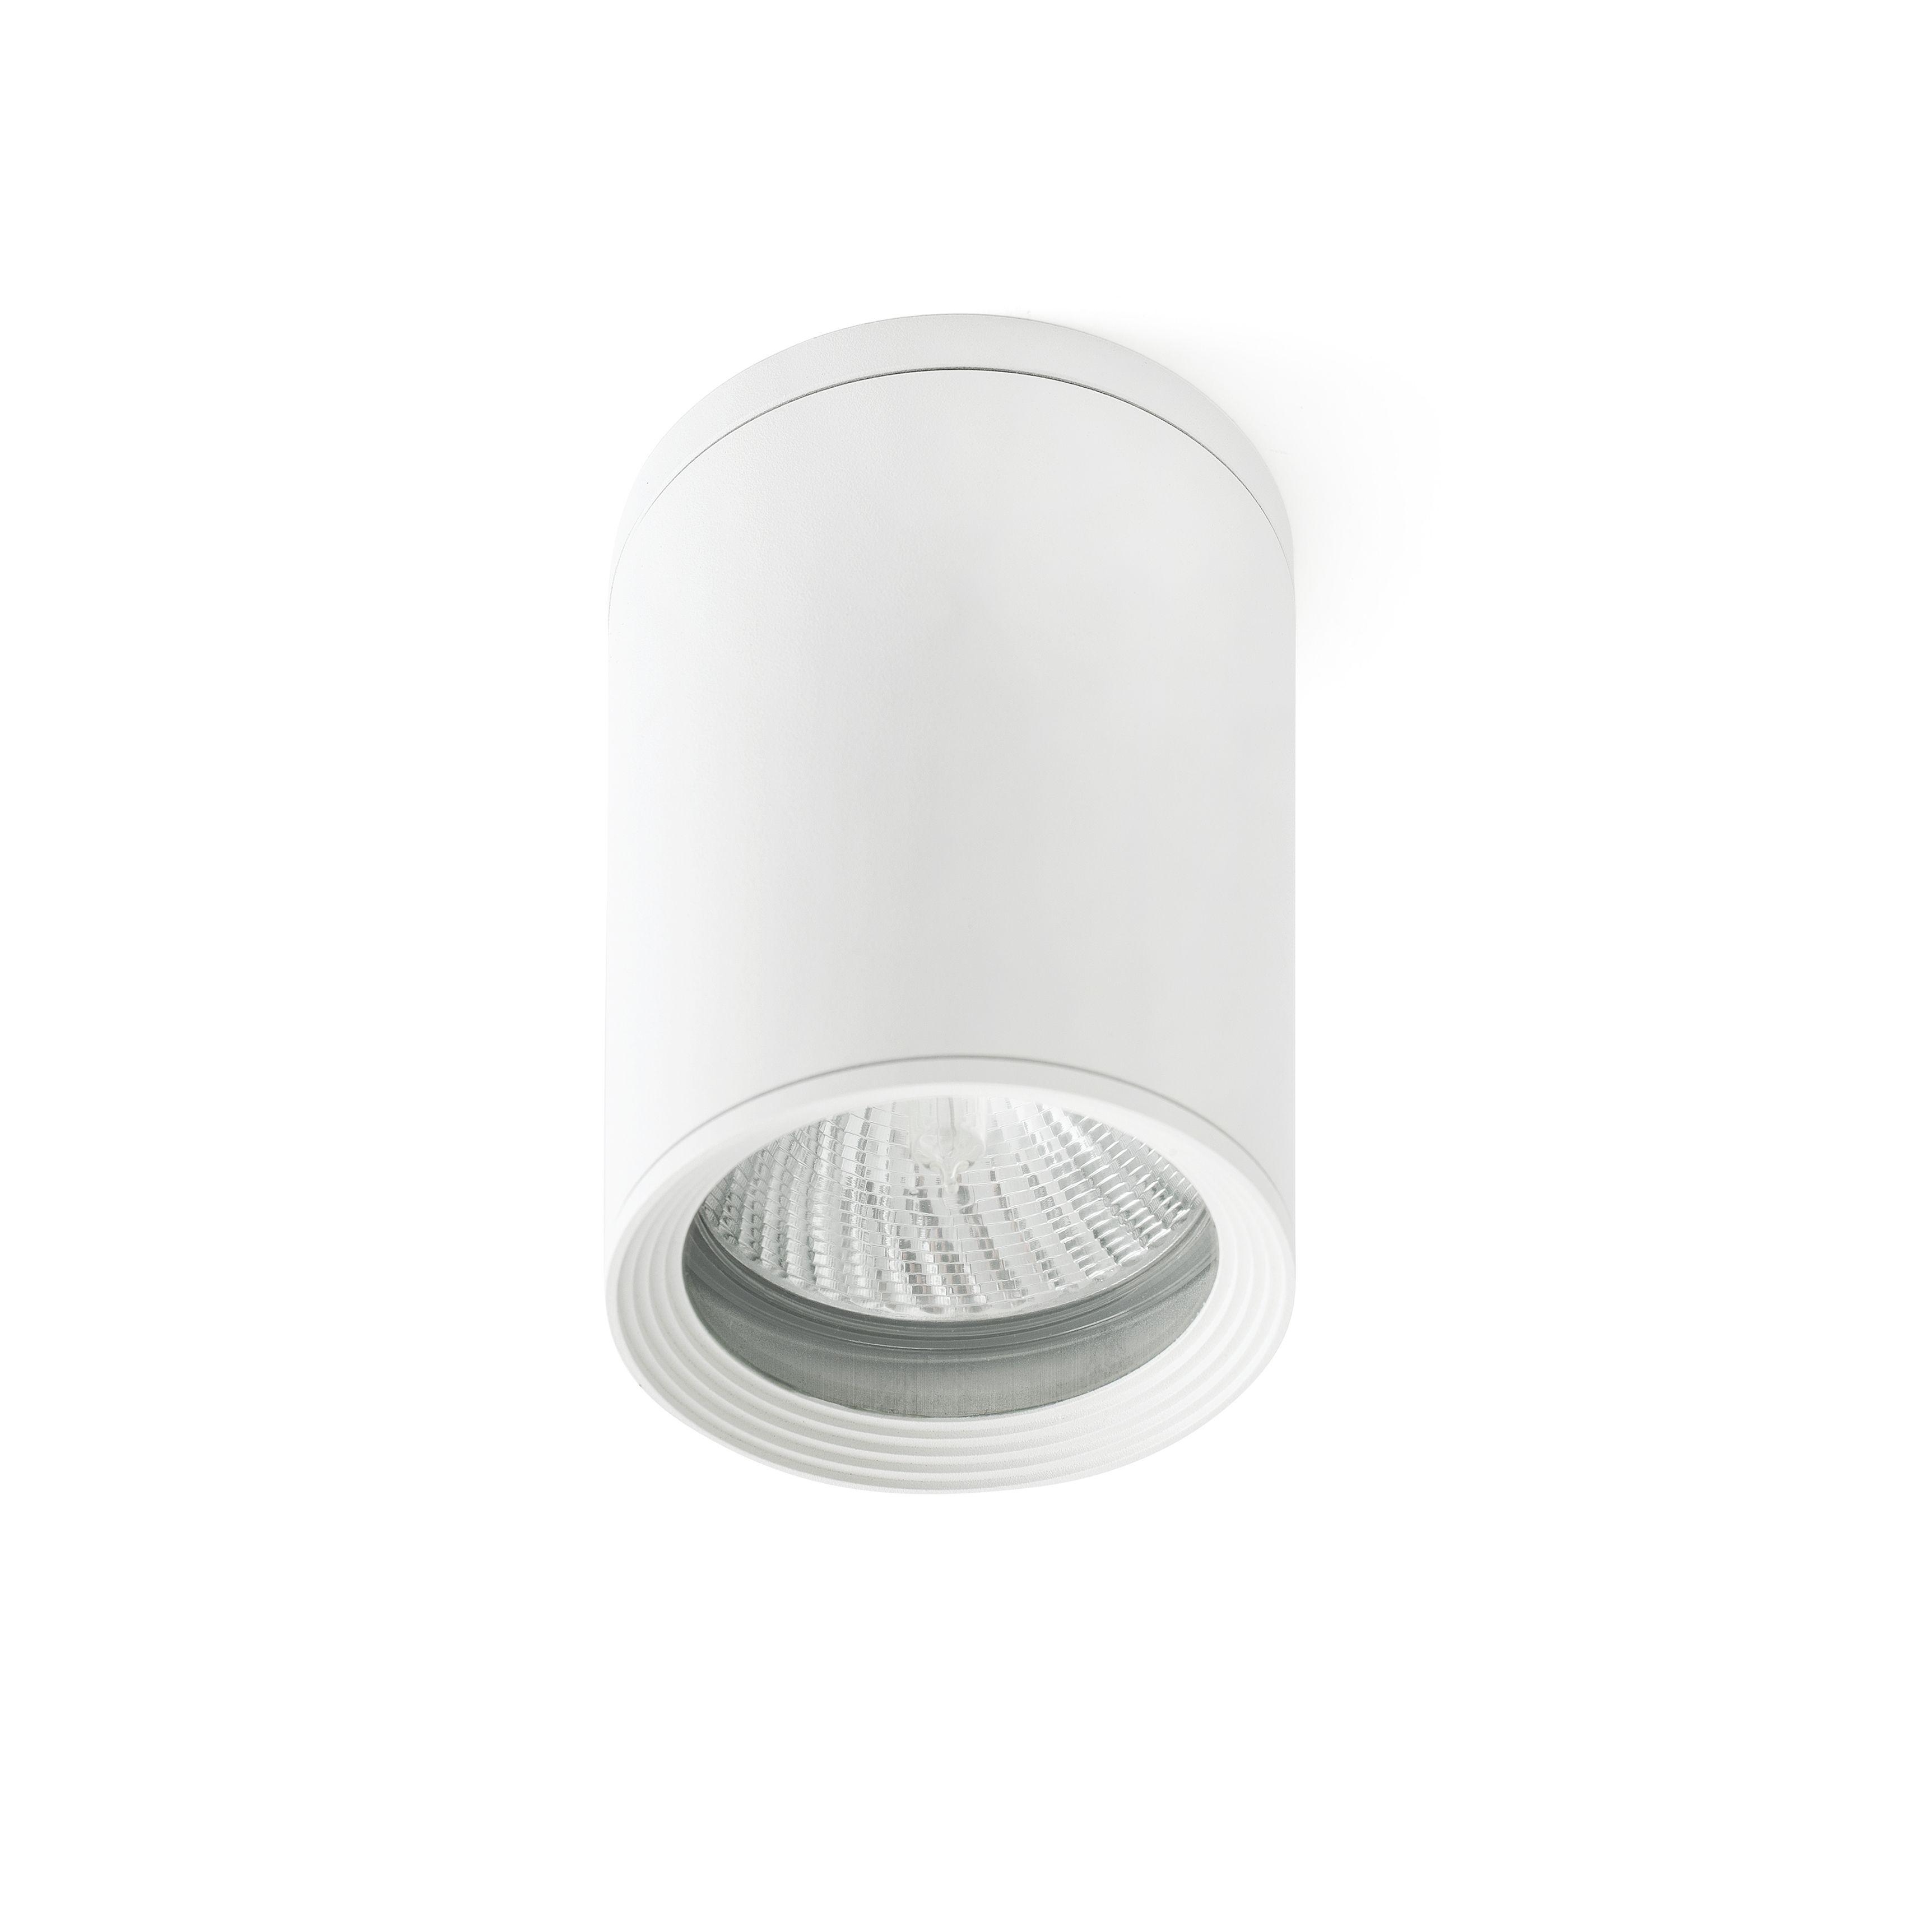 Tasa Lampe Plafond Blanche Pour Salle Bain Faro Deco Maison